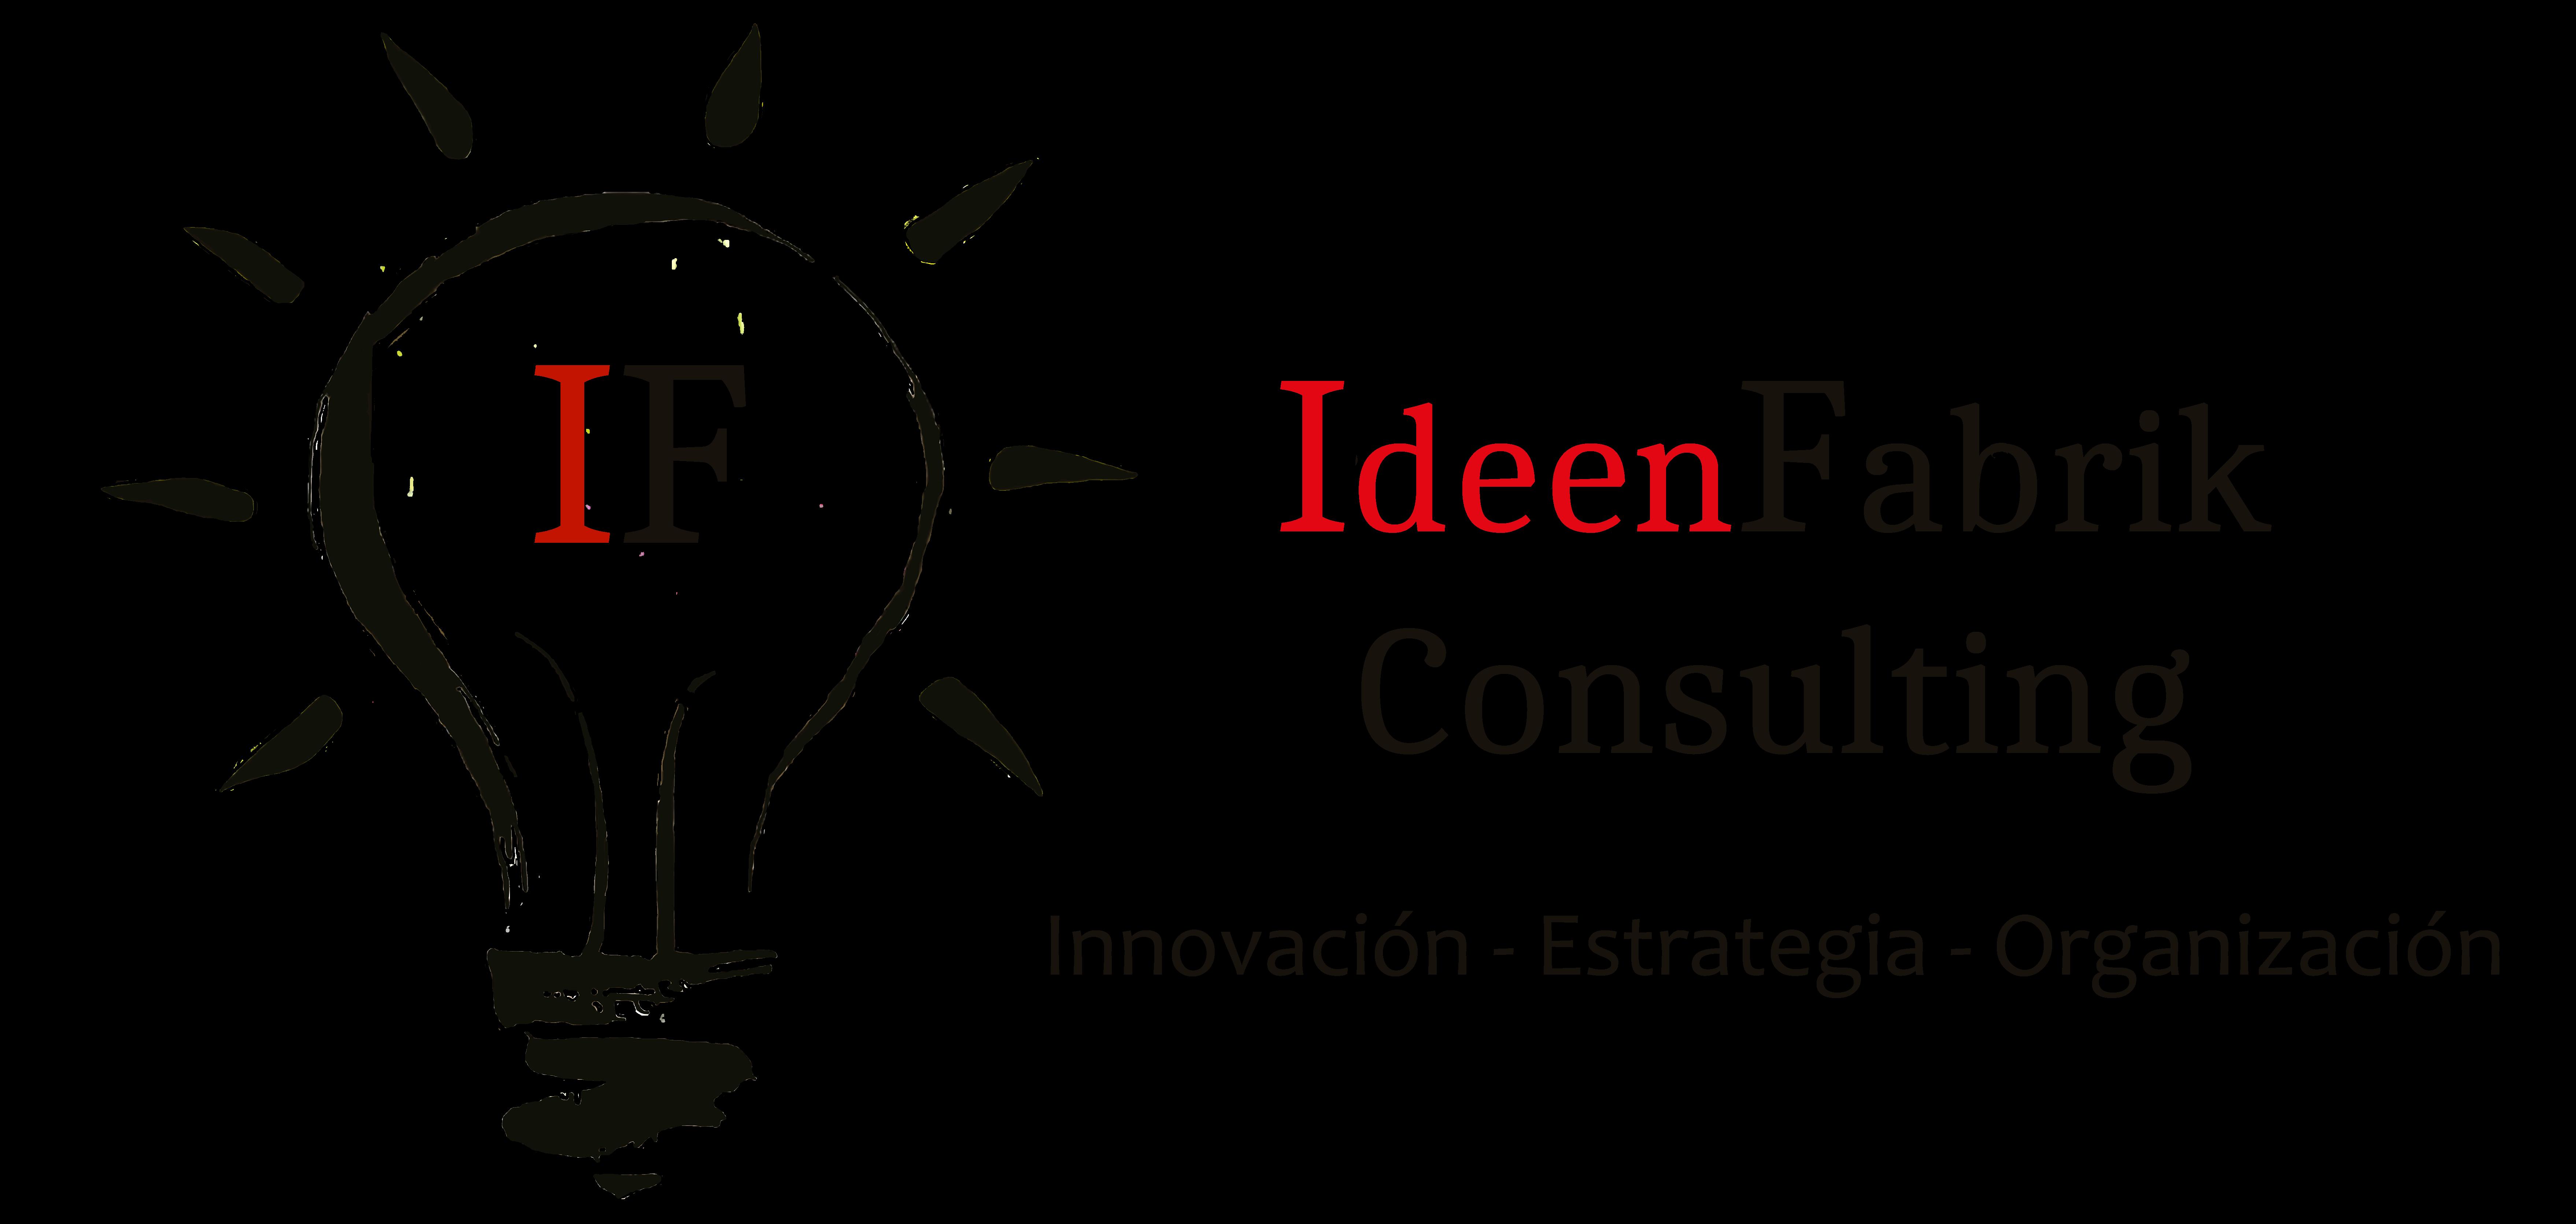 IdeenFabrik Consulting